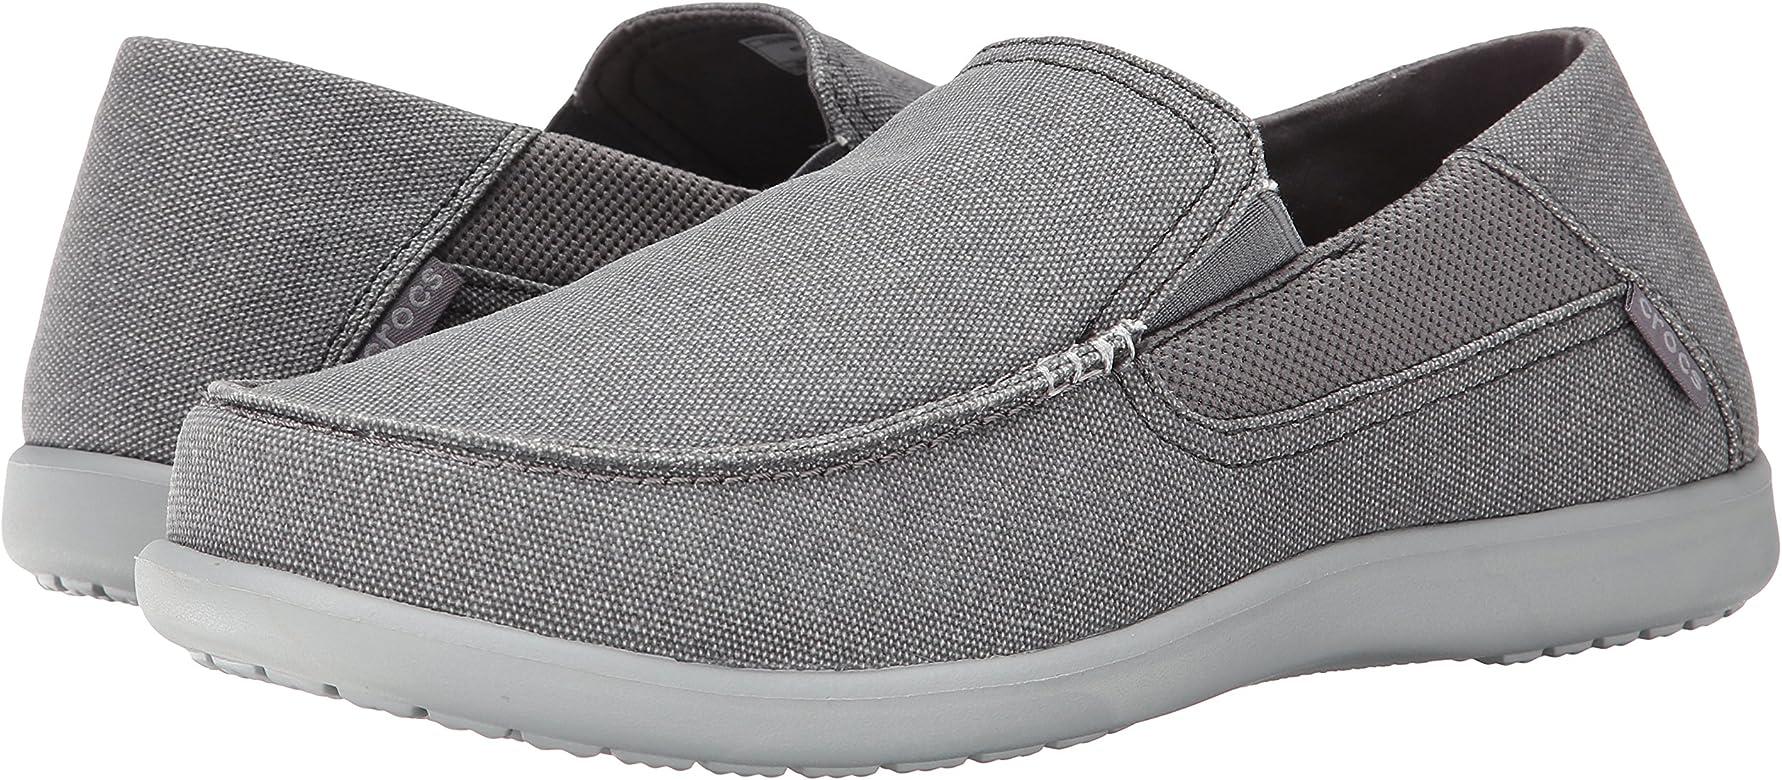 crocs Men's Santa Cruz 2 Luxe M Slip-On